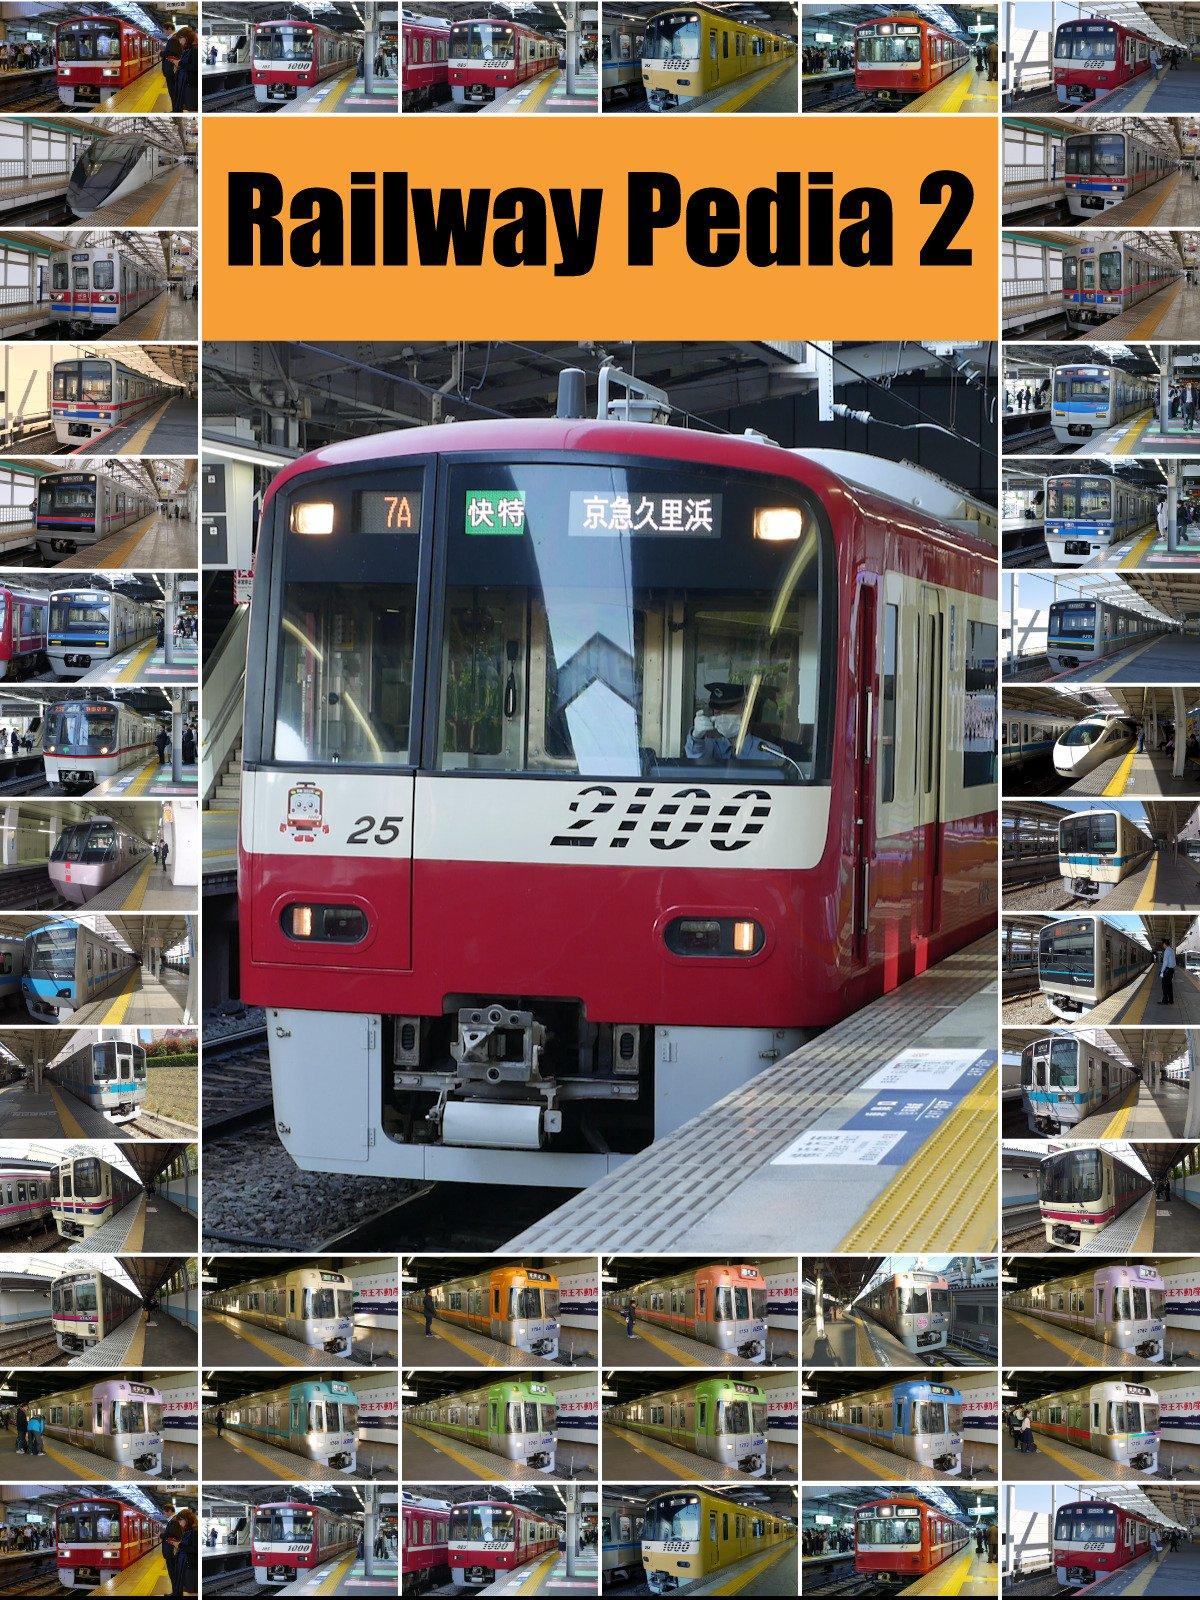 Railway Pedia 2